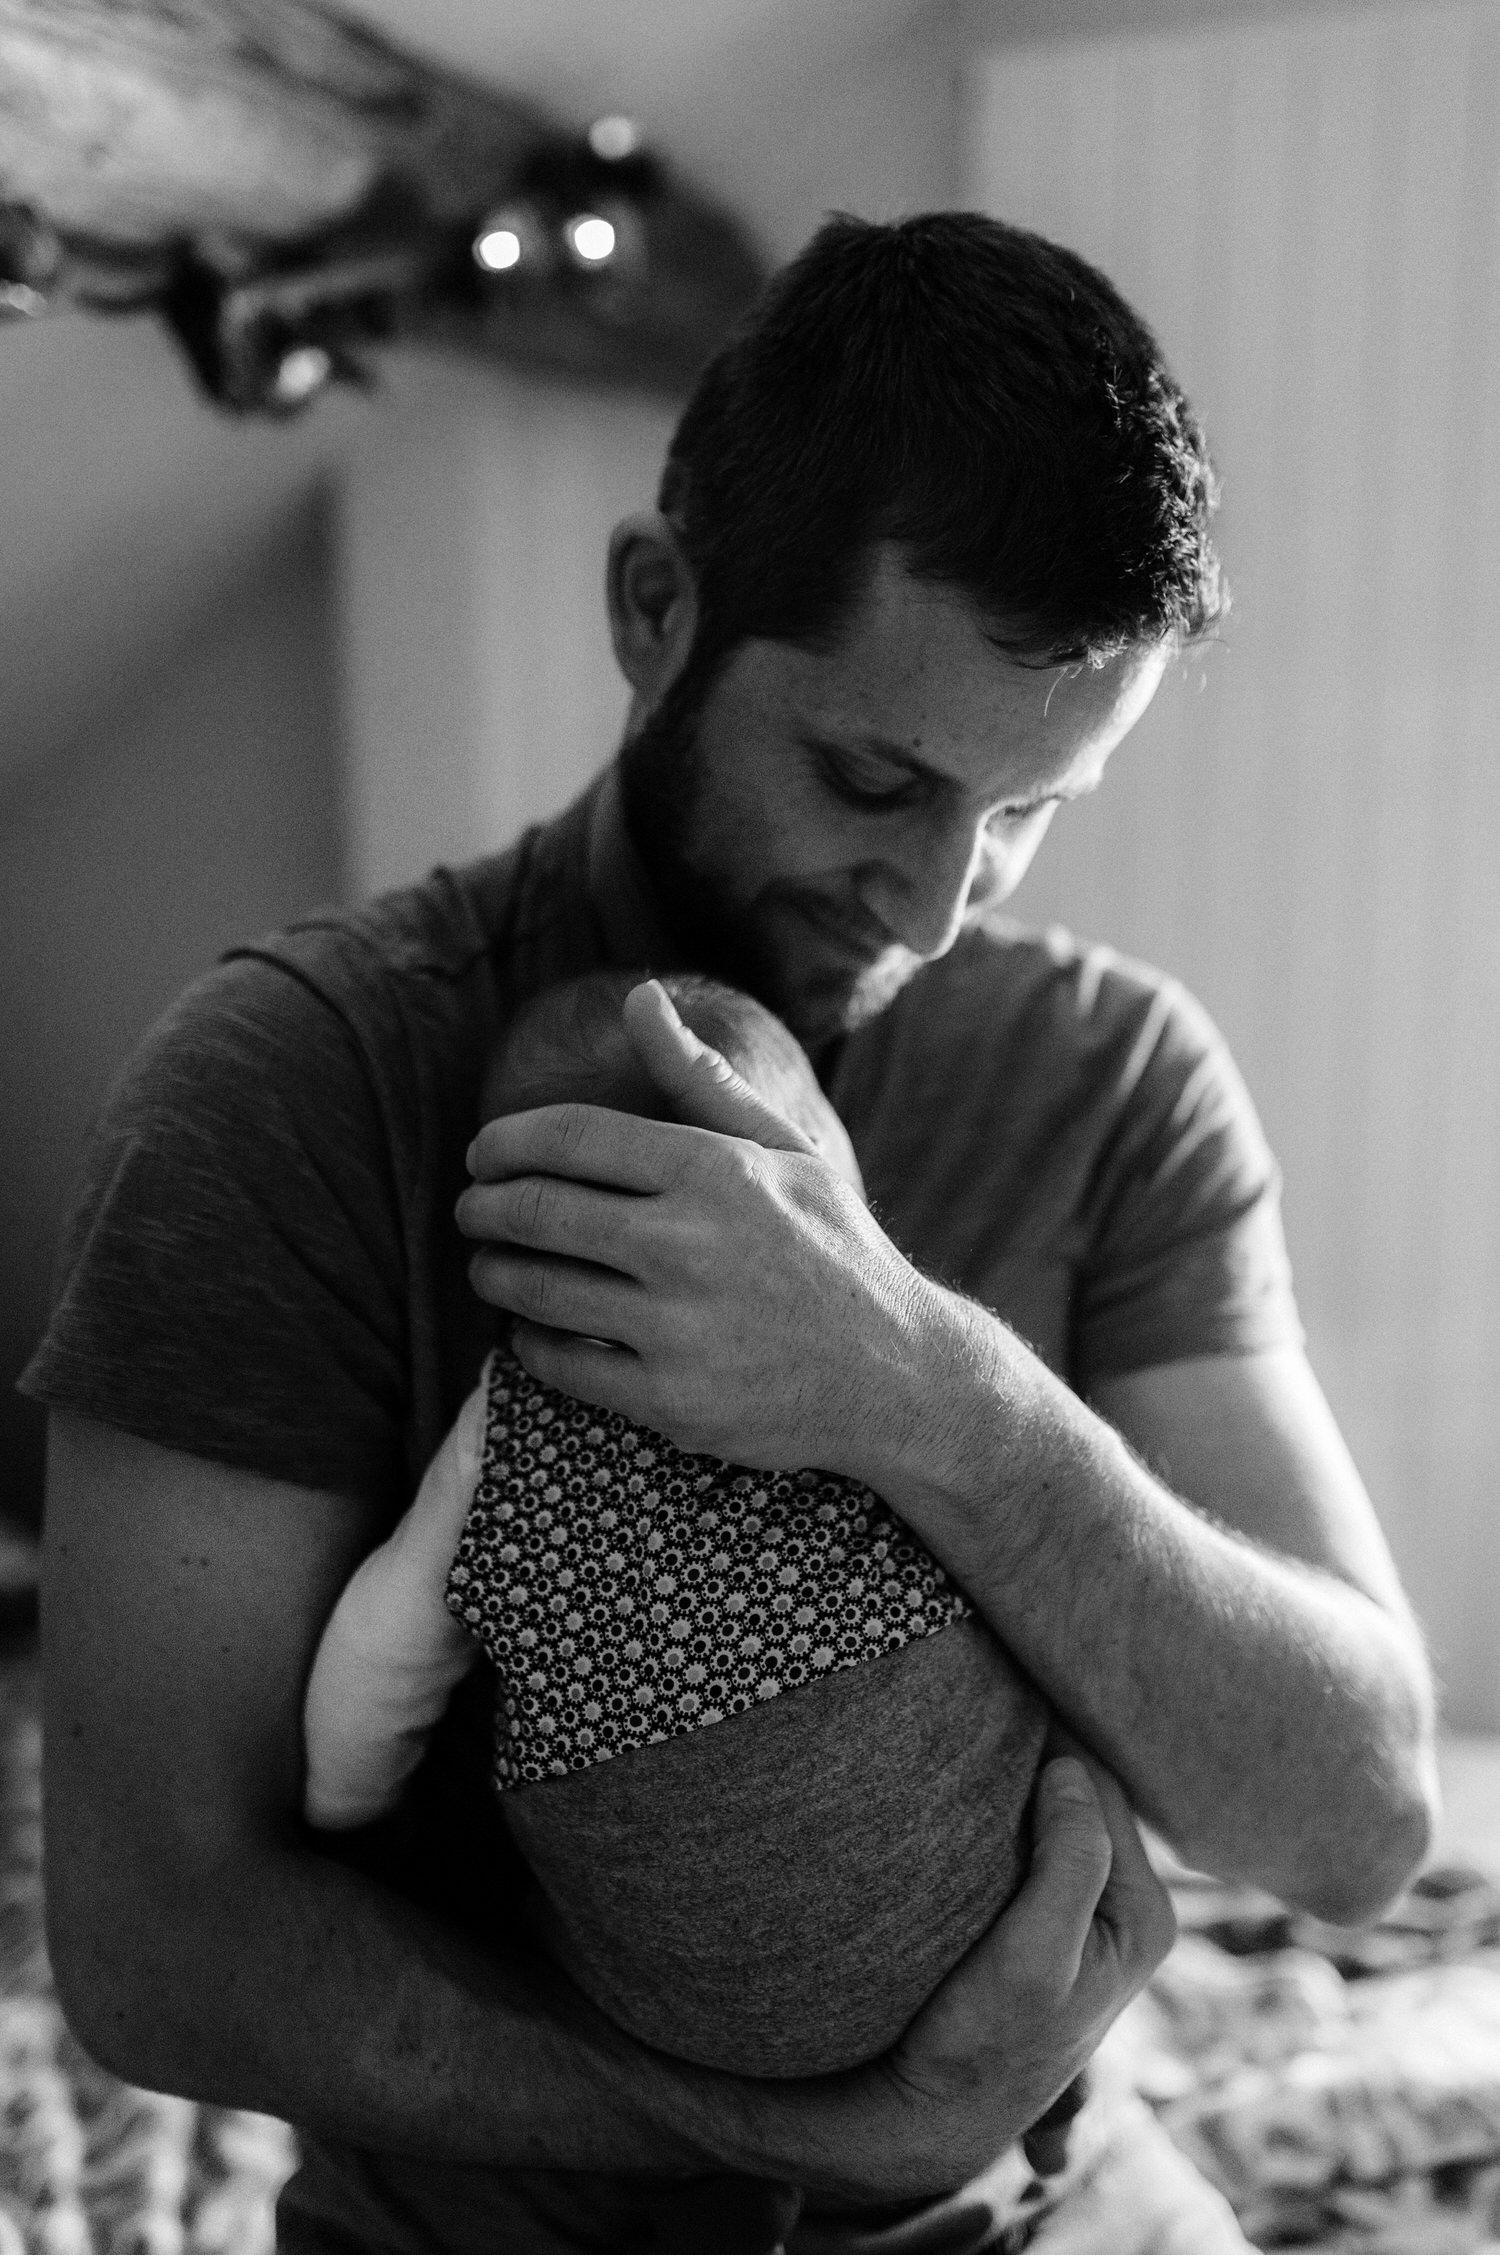 baby bilder, Baby Foto, baby fotograf, baby fotos, Babybilder, Babyfotograf, Fotograf Ostschweiz, Fotograf St. Gallen, Neugeborene Fotograf, Neugeborenebilder, Newborn Foto, Newborn Fotograf, Newborn Photography